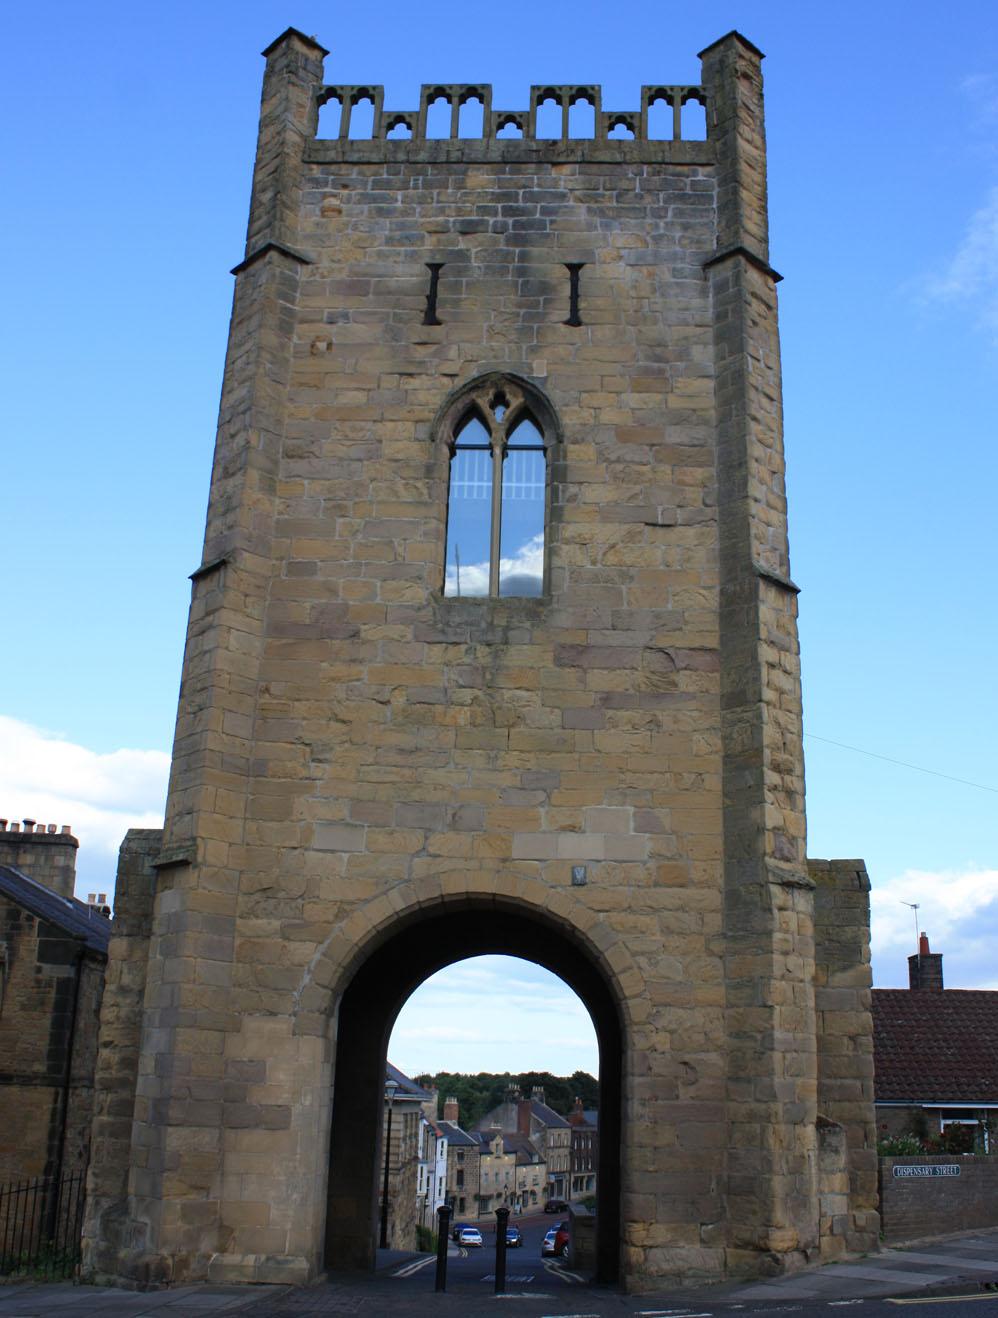 Pottergate Tower gate. Alnwick